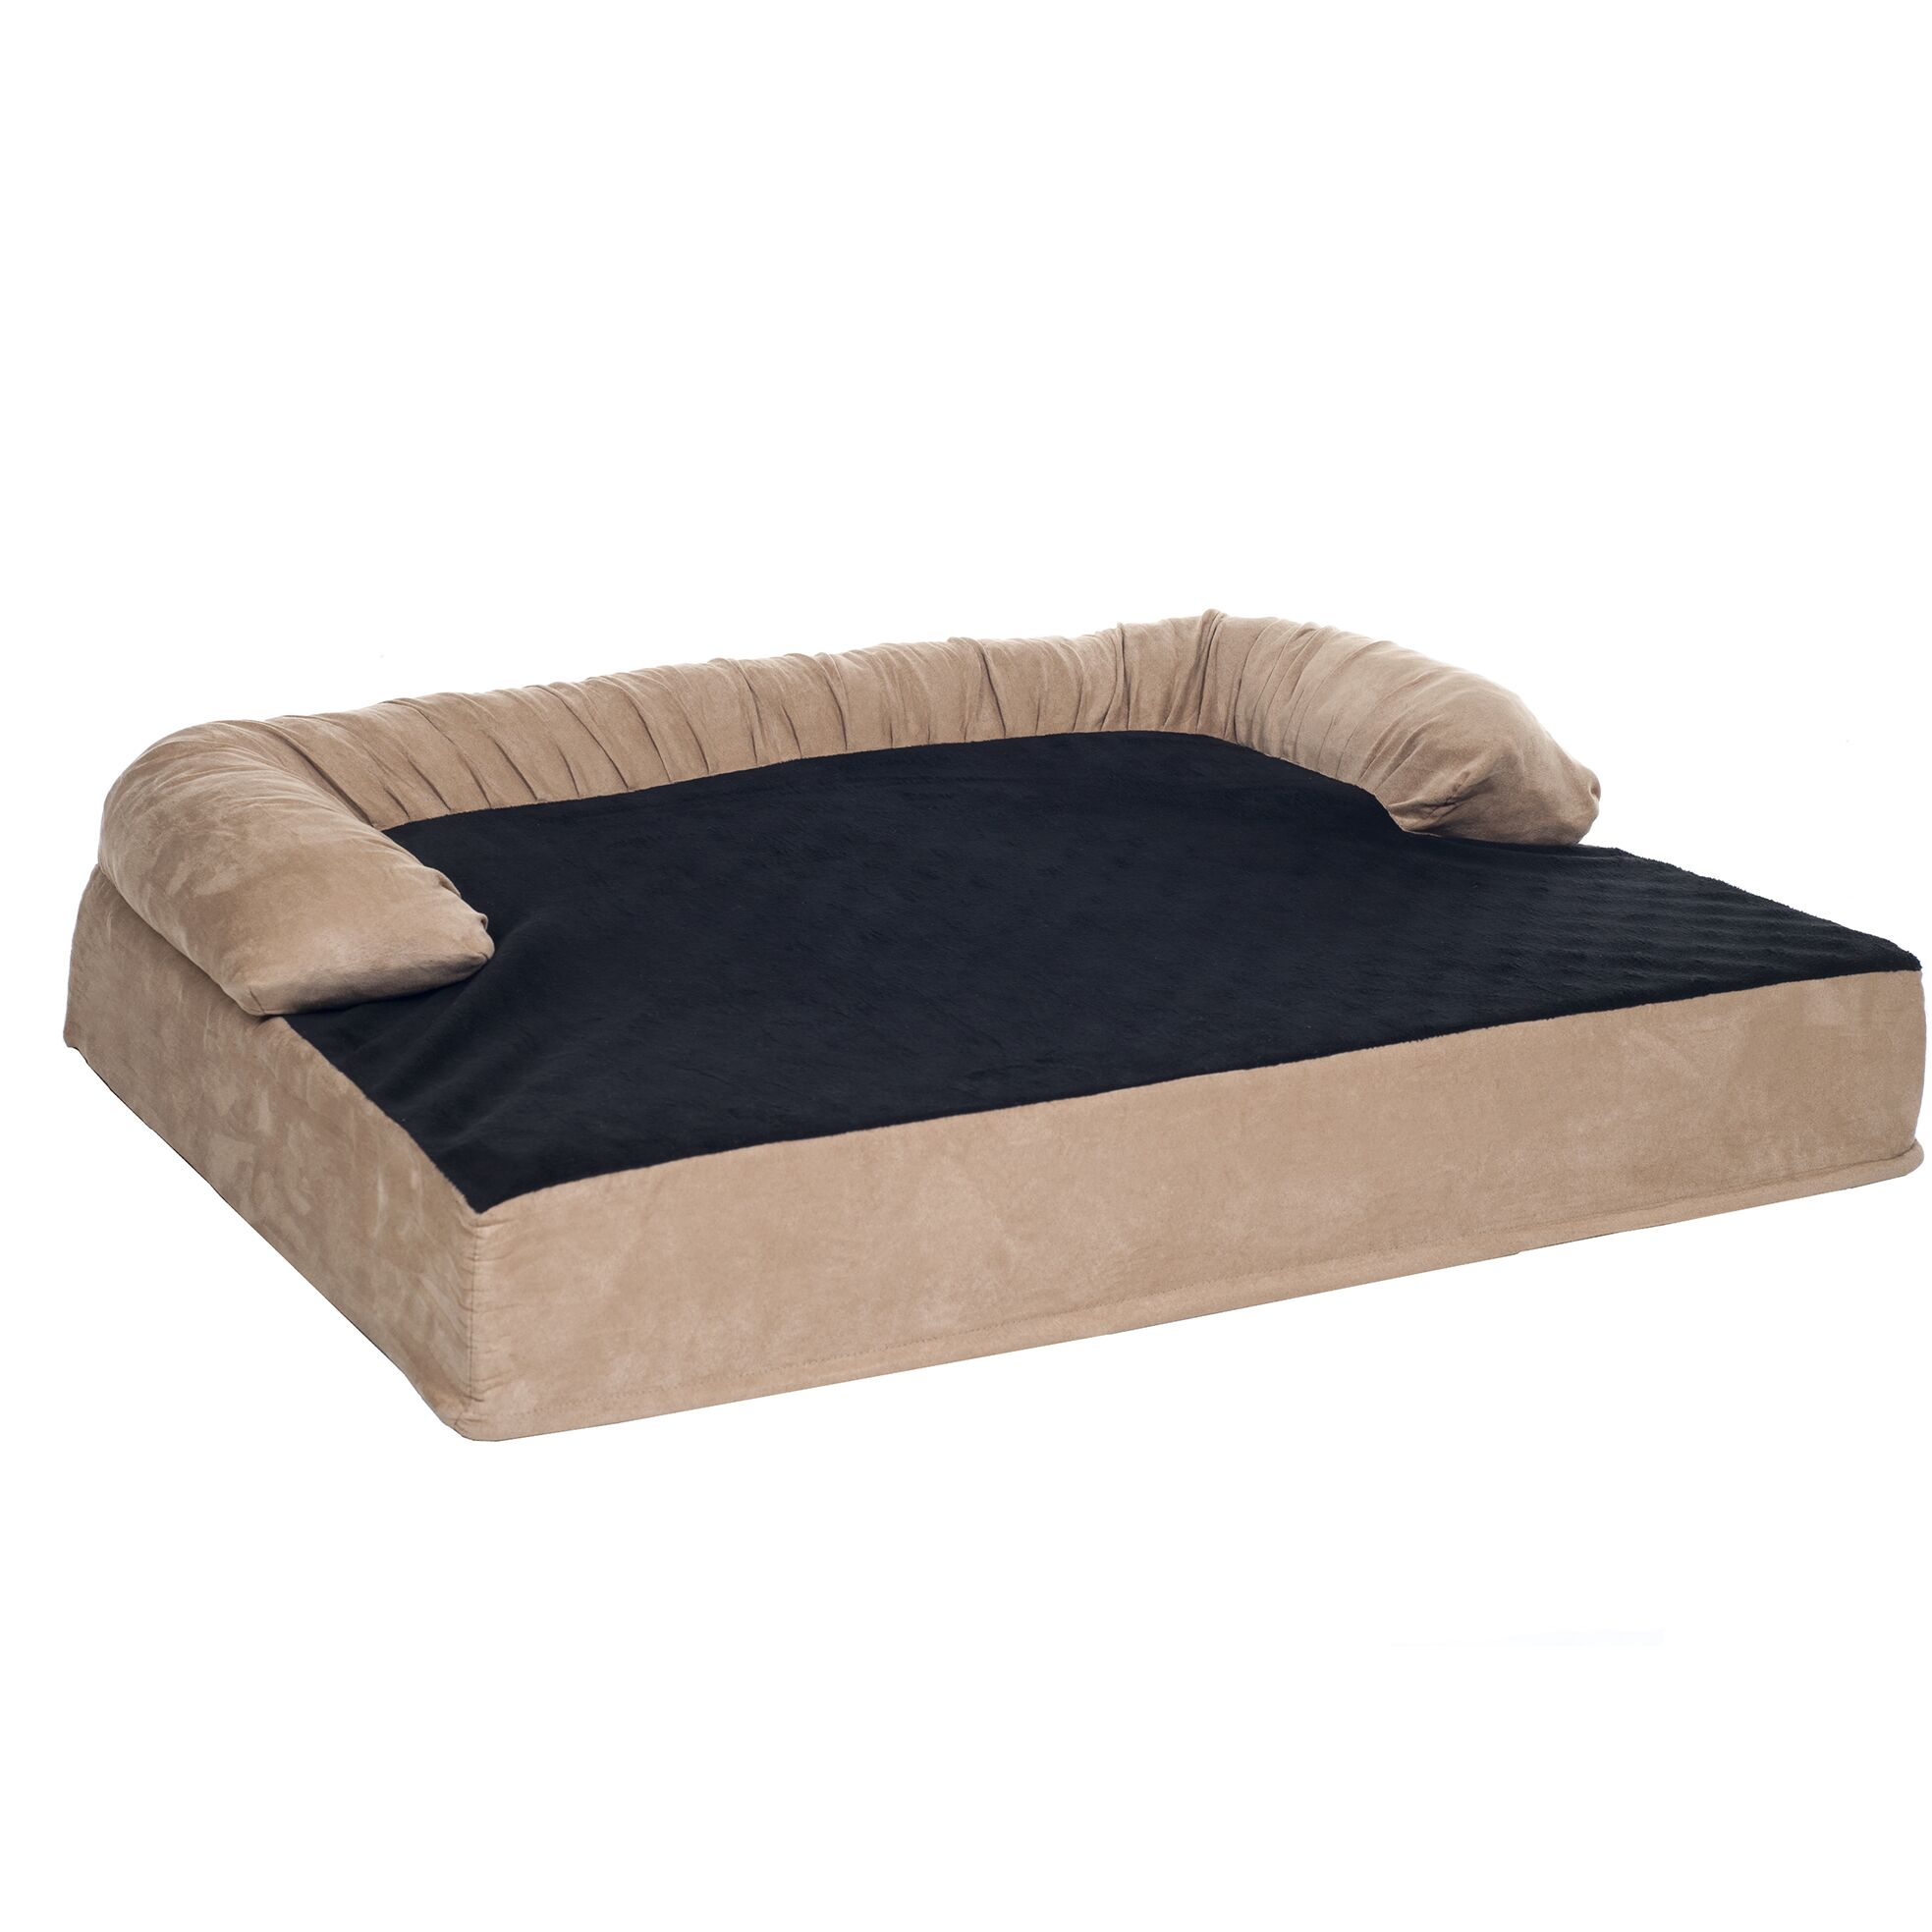 Casper Orthopedic Memory Foam Pet Bolster Bed with Removable Plush Memory Foam Size: Medium (35.5